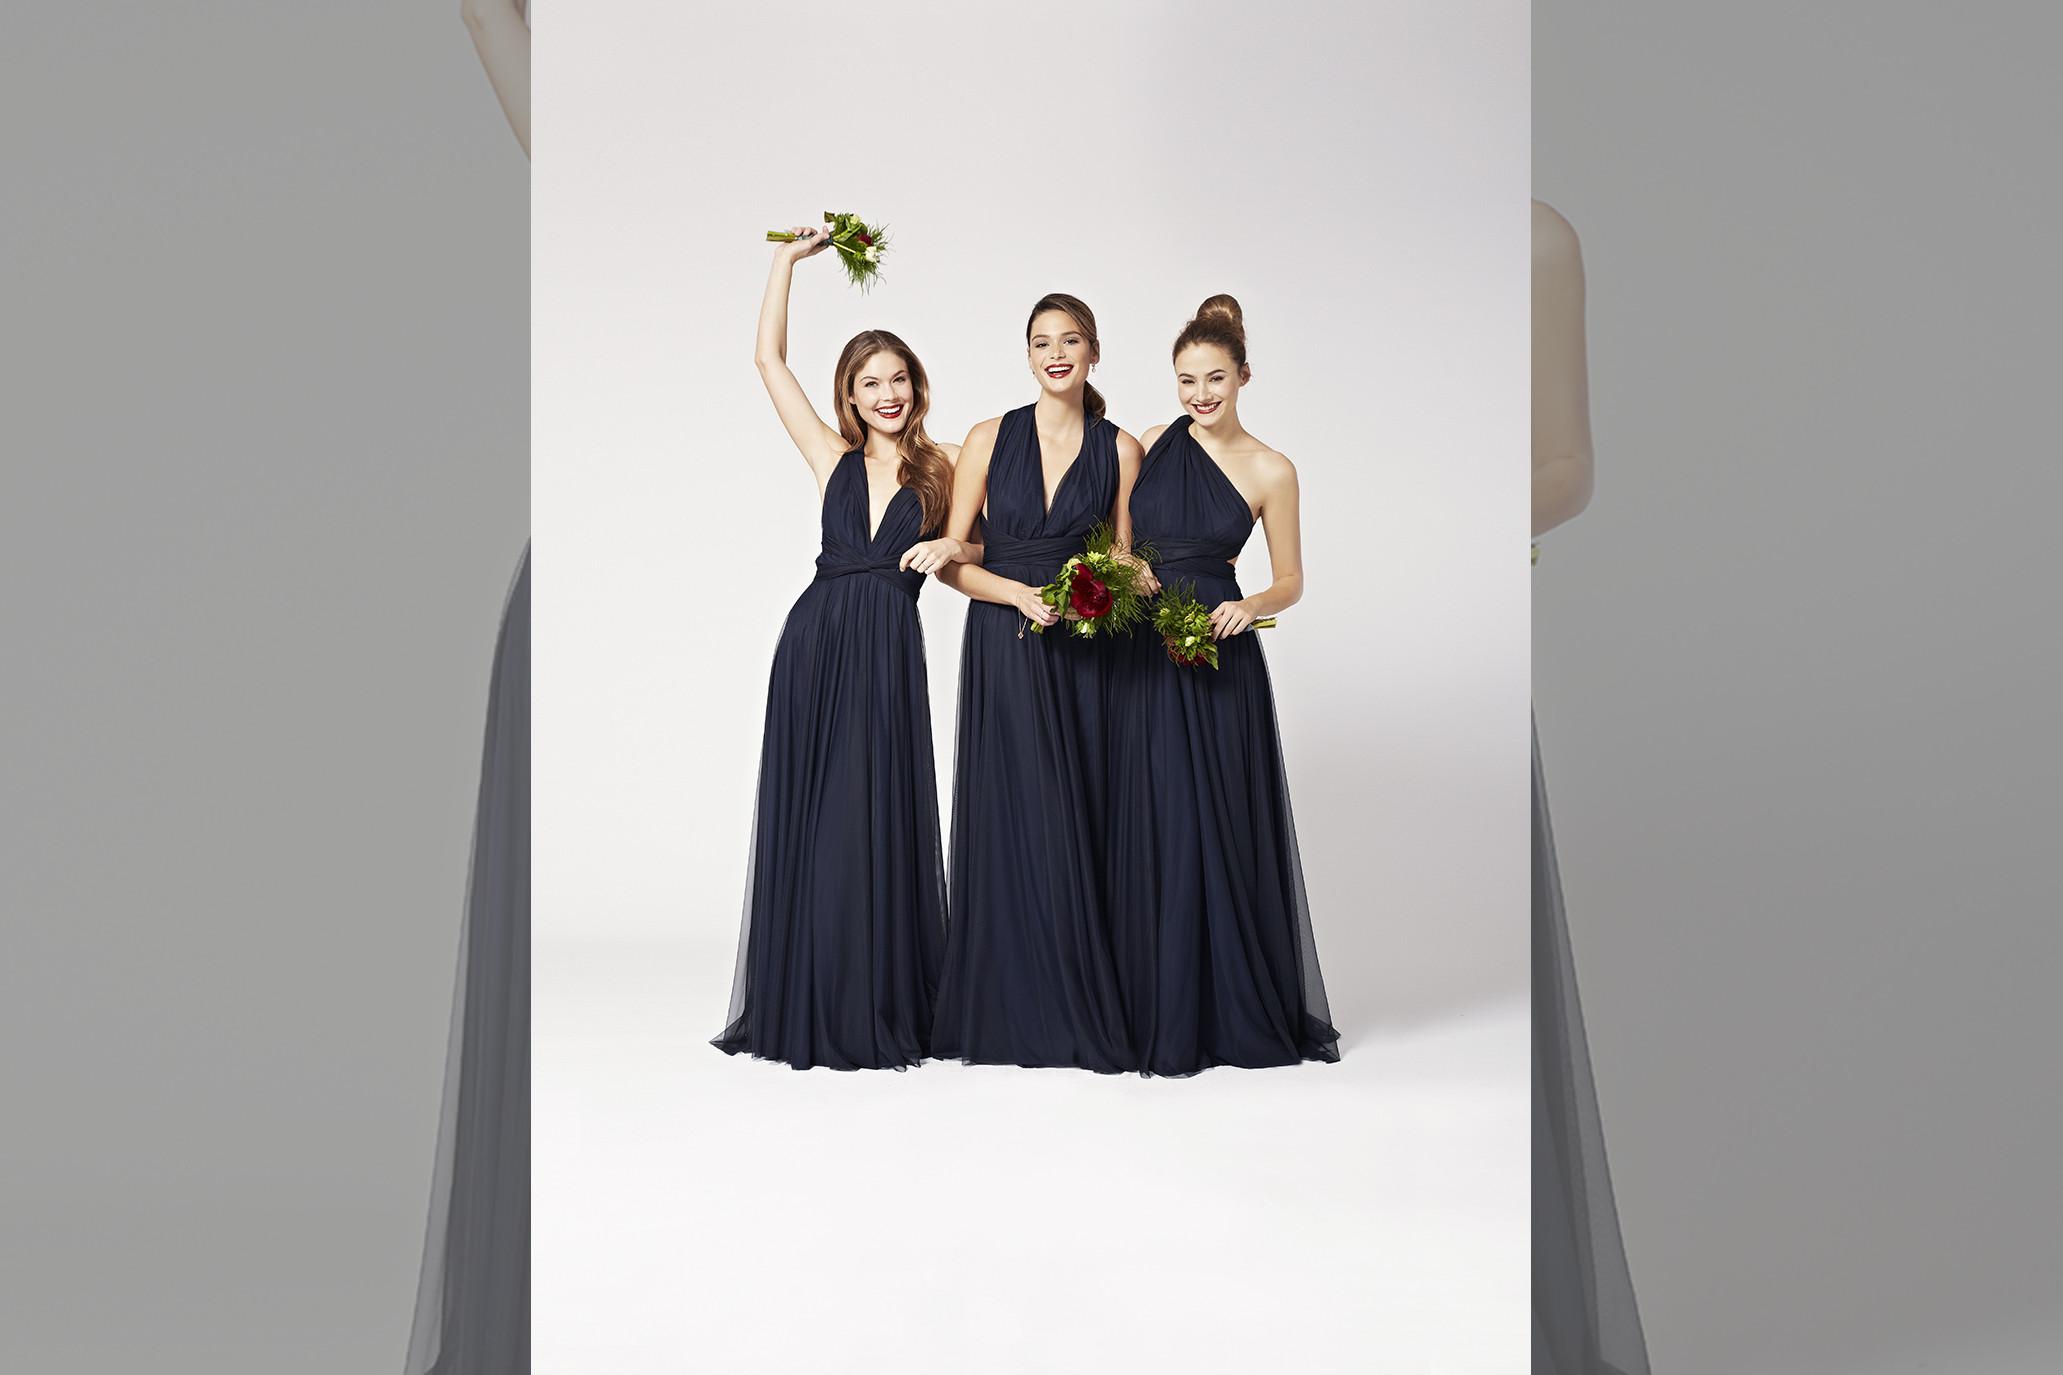 bridebook.co.uk-twobirds navy dresses smiling